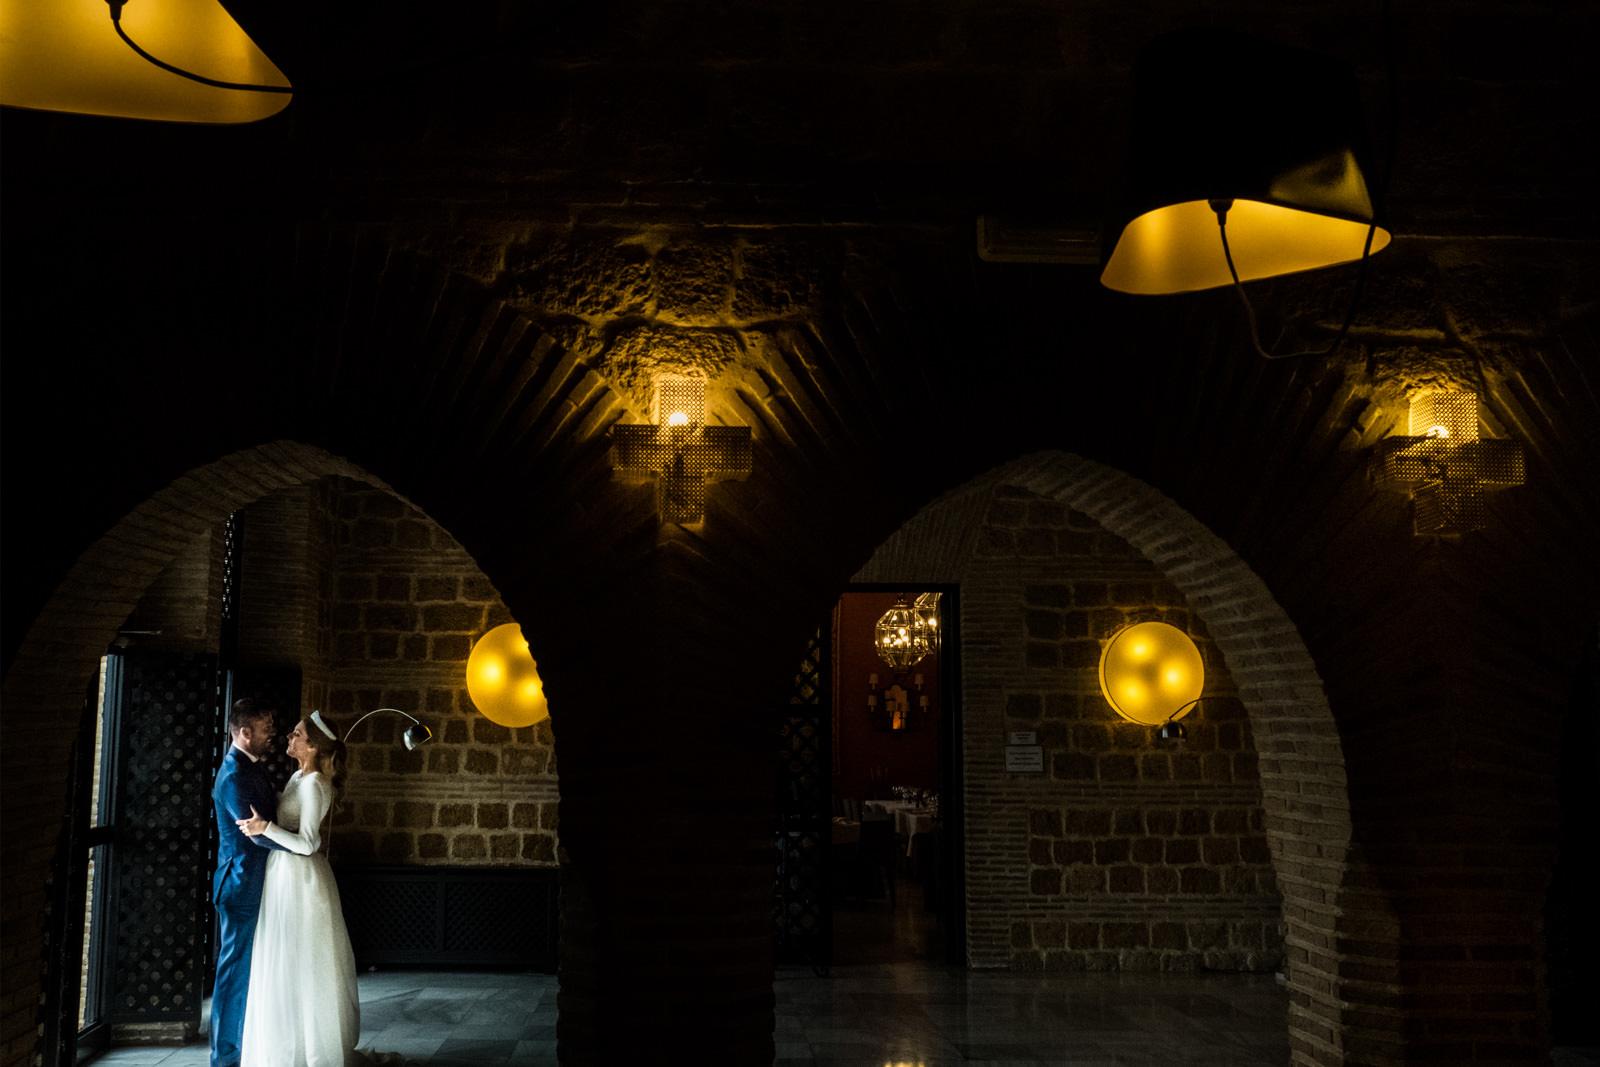 Wedroads-Boda-Sevilla-Parador-Carmona-bridal-engagement-Rafael-Torres-fotografo-bodas-sevilla-madrid-barcelona-wedding-photographer--55.jpg